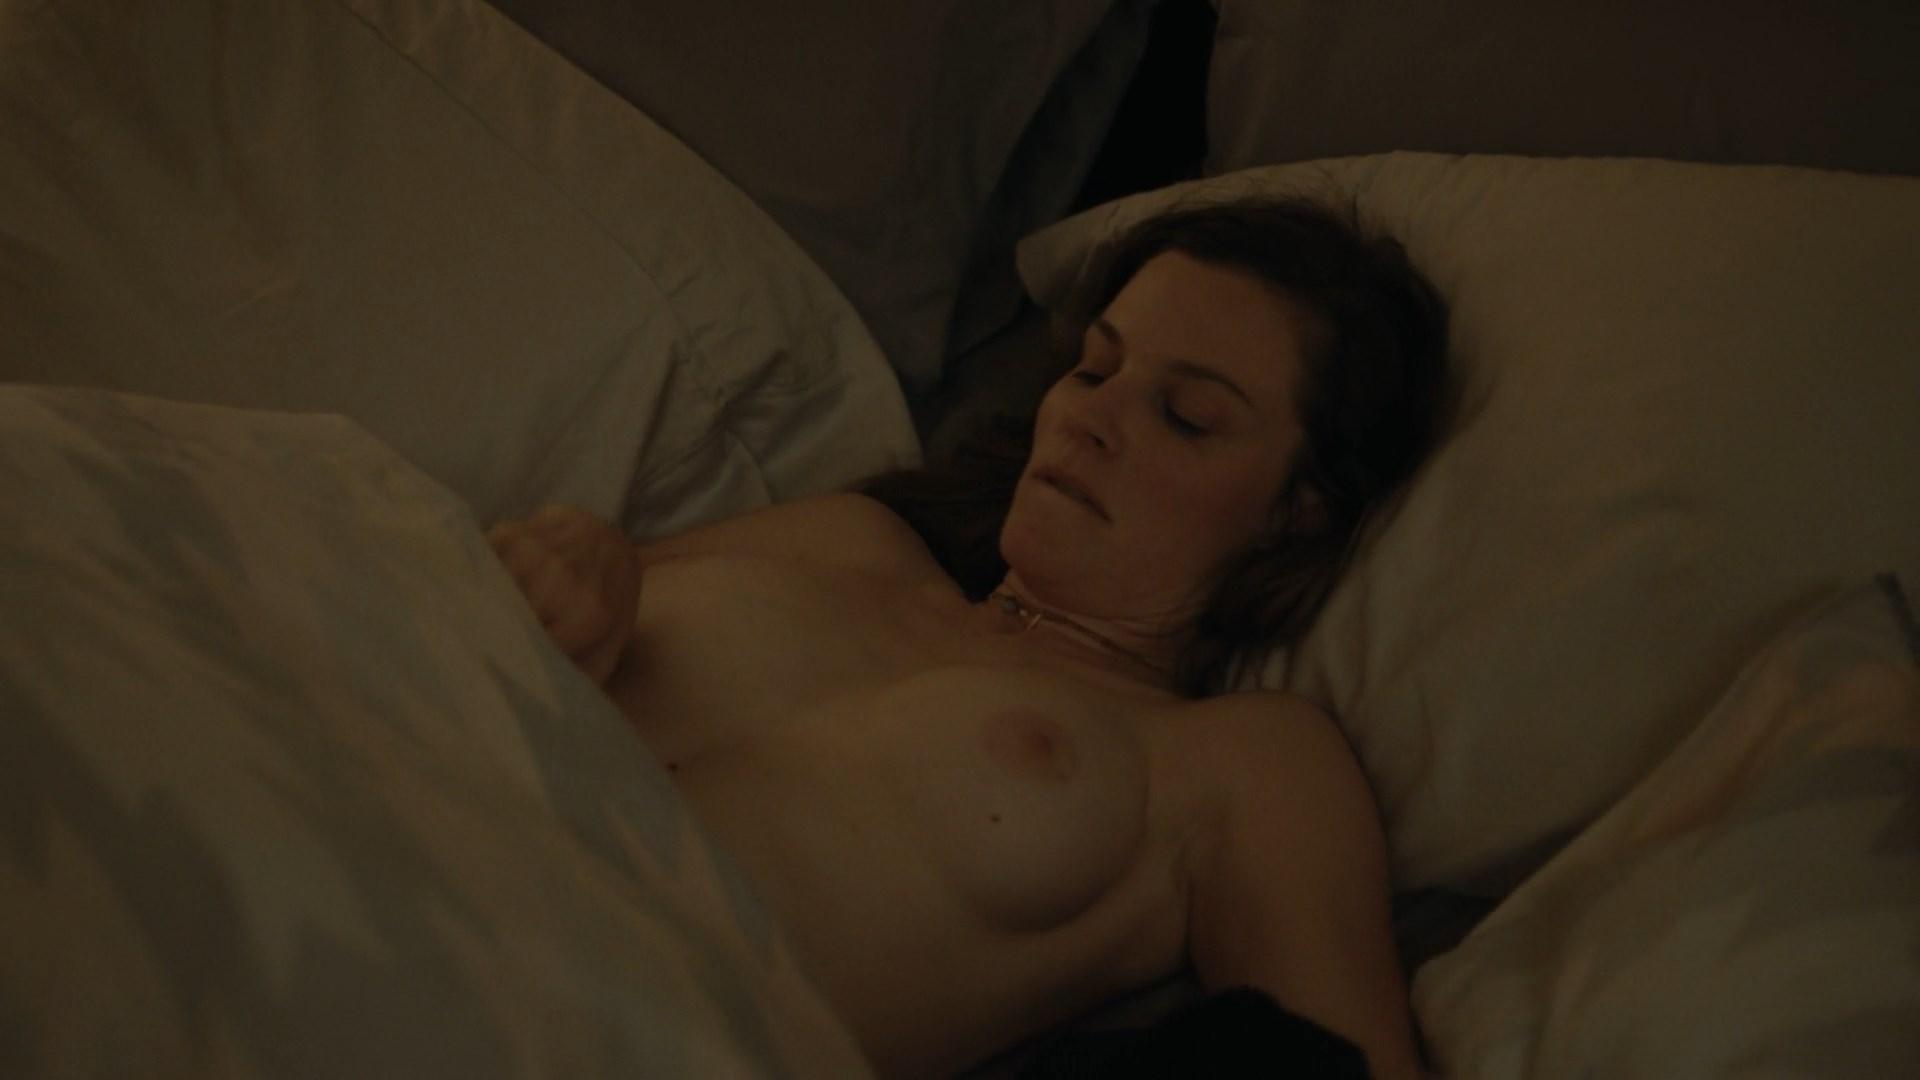 Lola kirke and breeda wool sex in awol scandalplanetcom 3